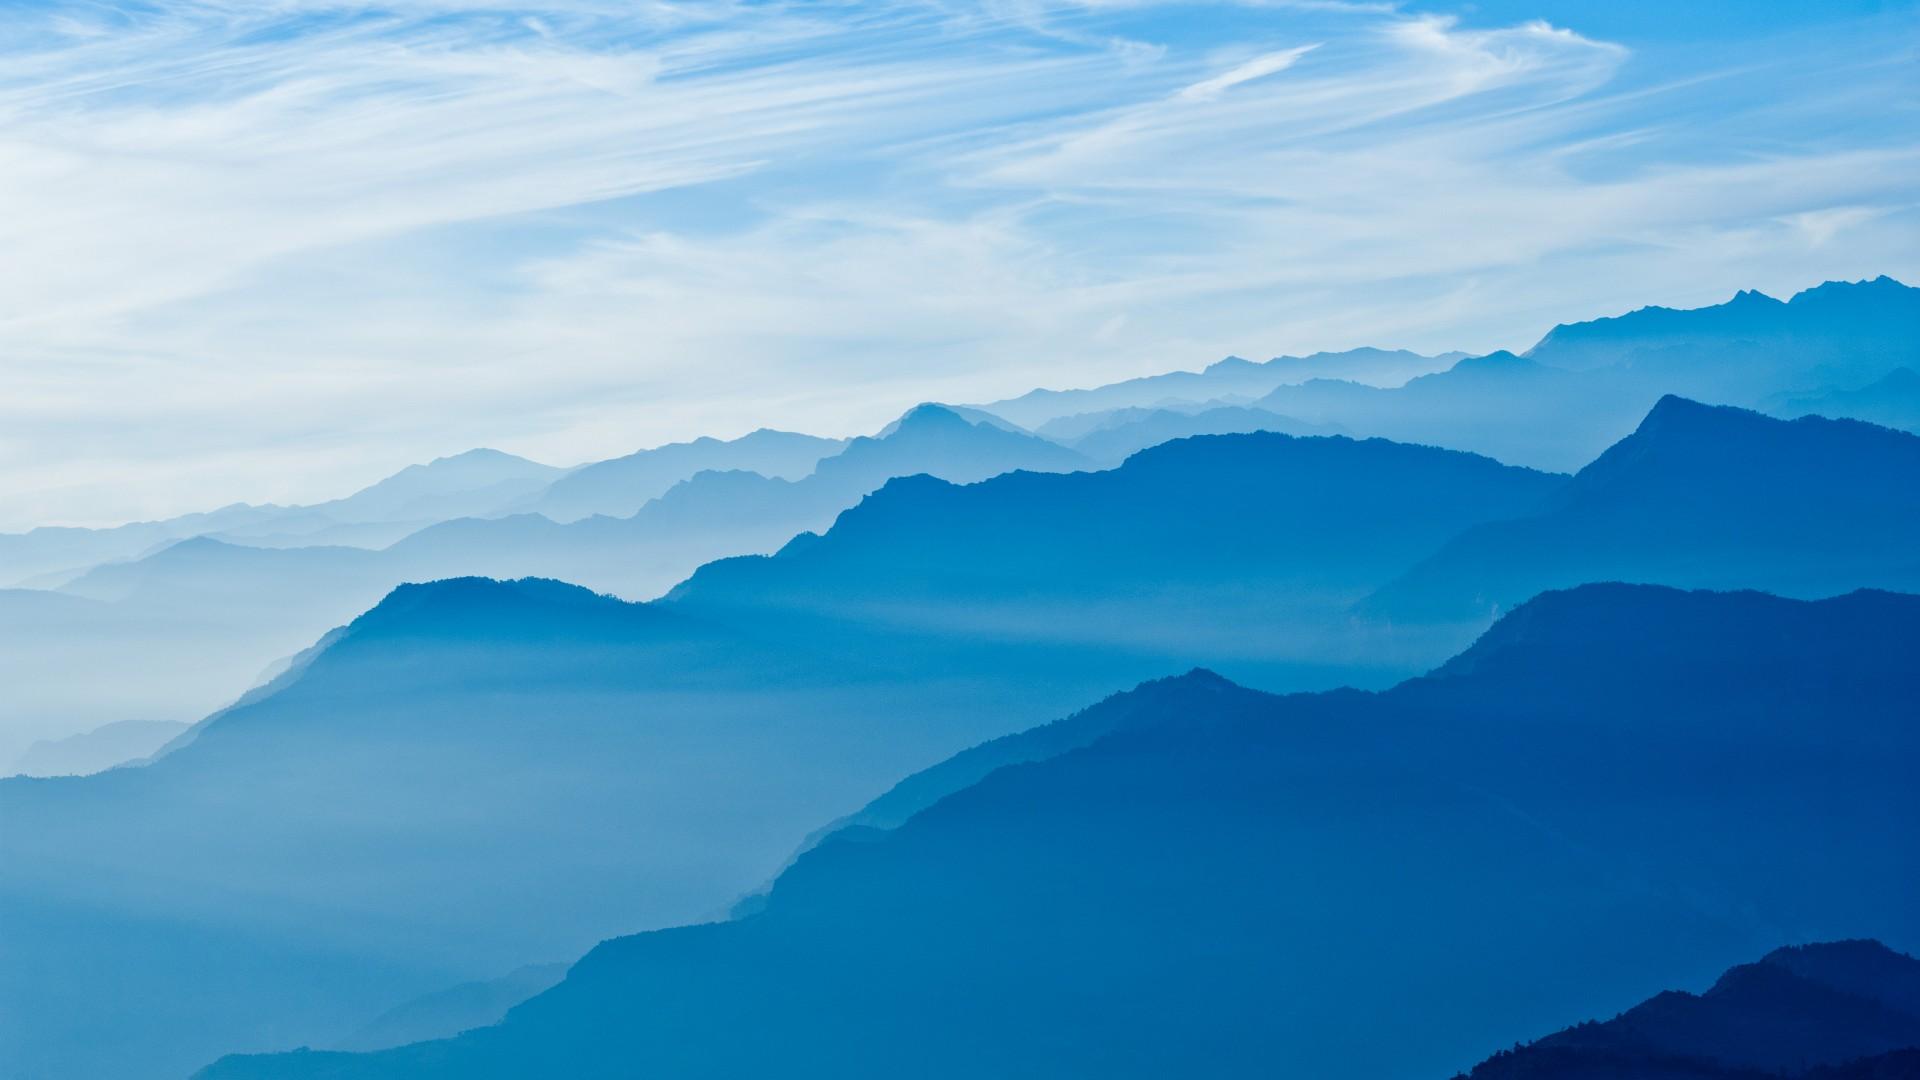 Os X El Capitan Iphone Wallpaper Himalaya Mountains 4k Wallpapers Hd Wallpapers Id 18878